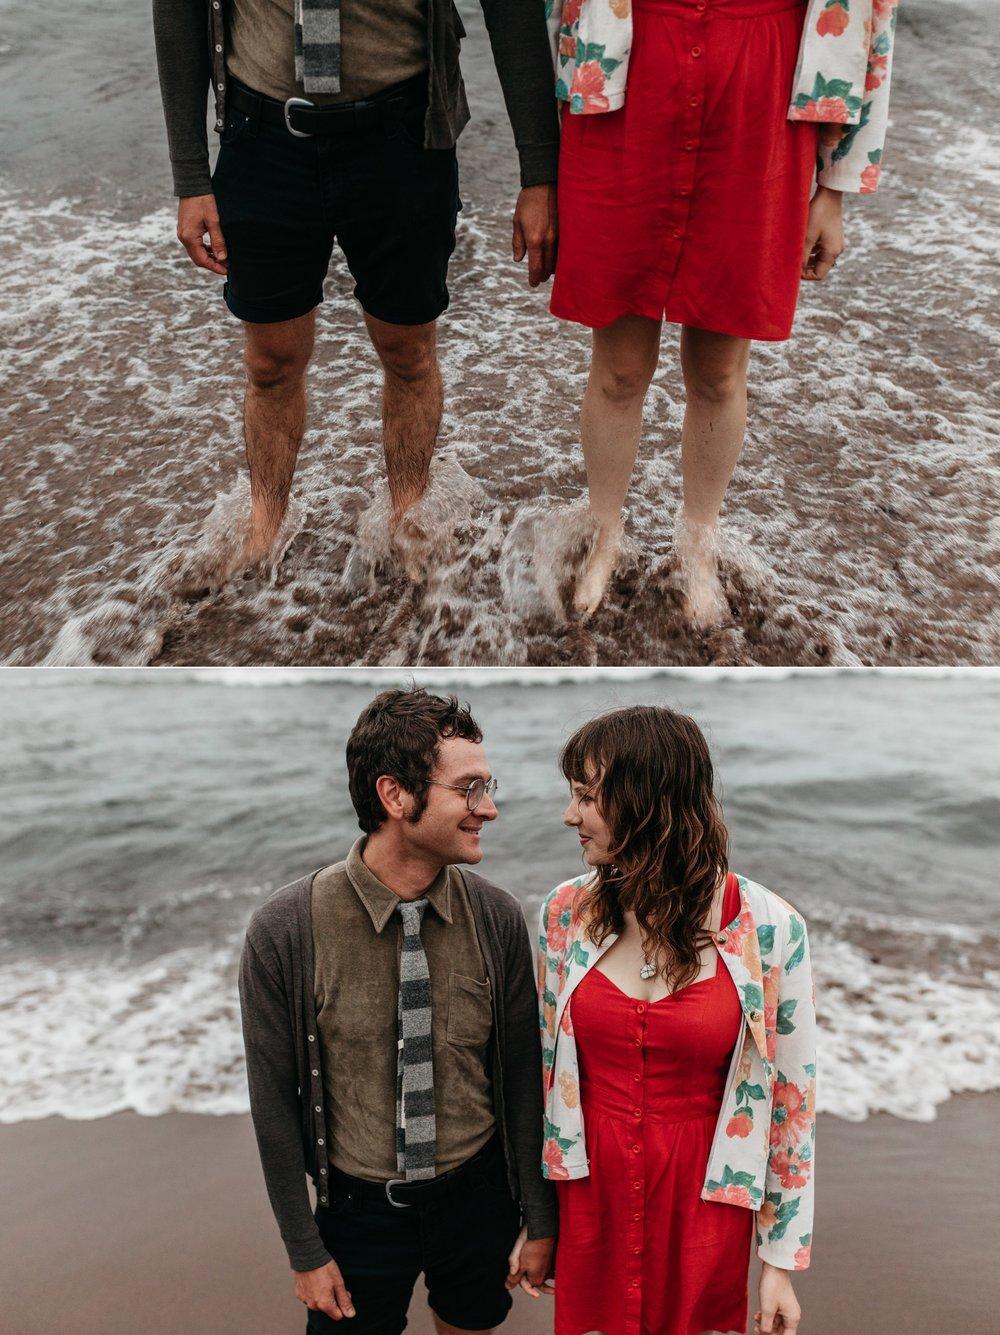 mandy-aaron-austin-minnesota-minneapolis-wedding-photographer-destination-elopement-intimate-adventurous_0024.jpg